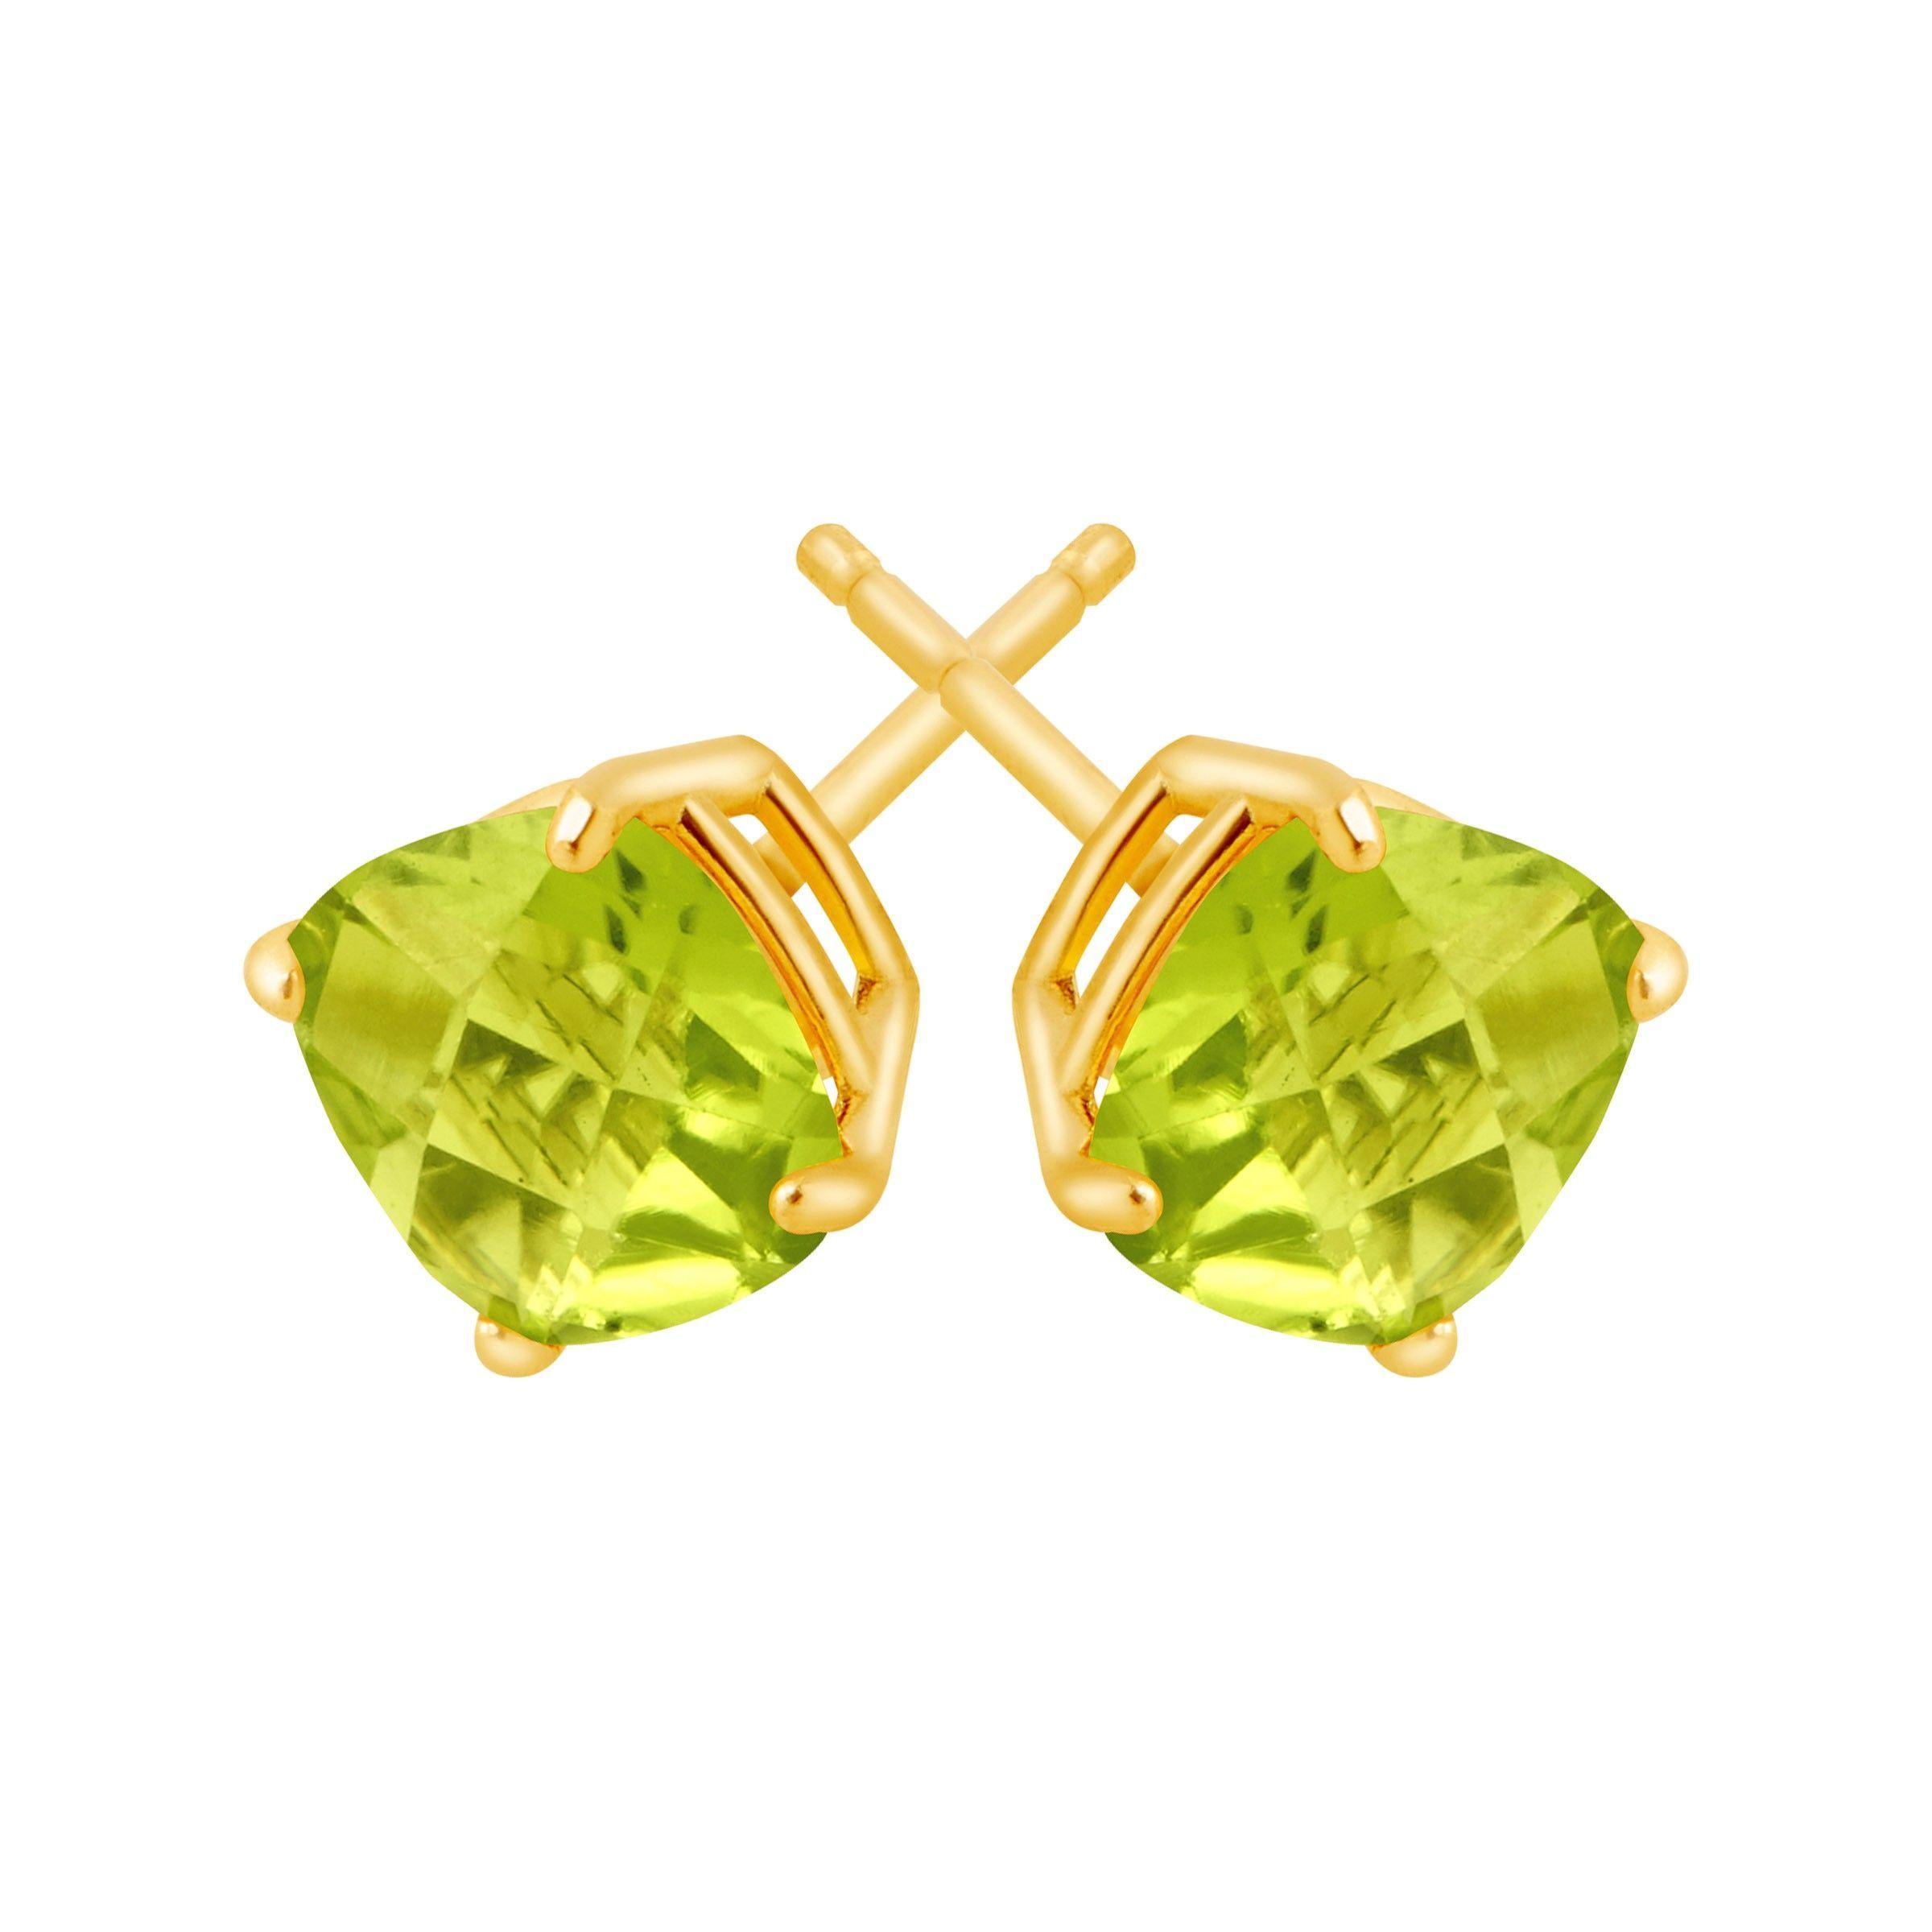 Cushion-Cut-Color-Stone-Stud-Earrings-in-14K-Gold thumbnail 32